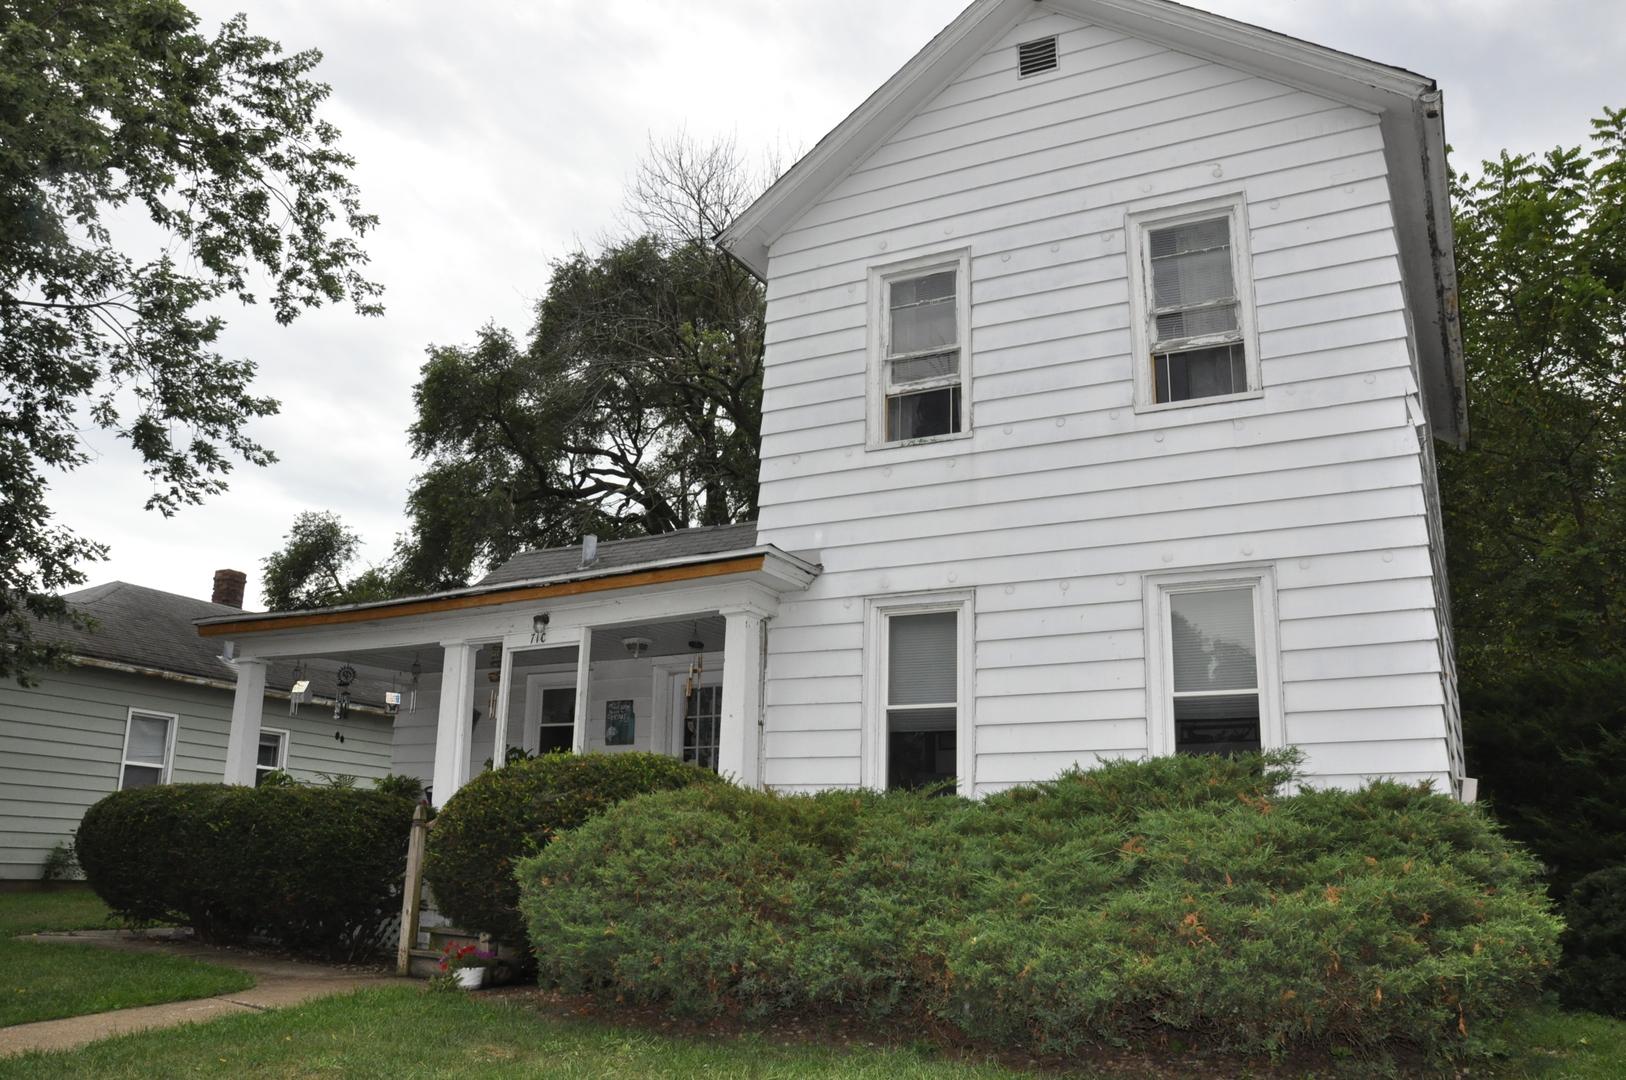 710 North Monroe, Streator, Illinois, 61364